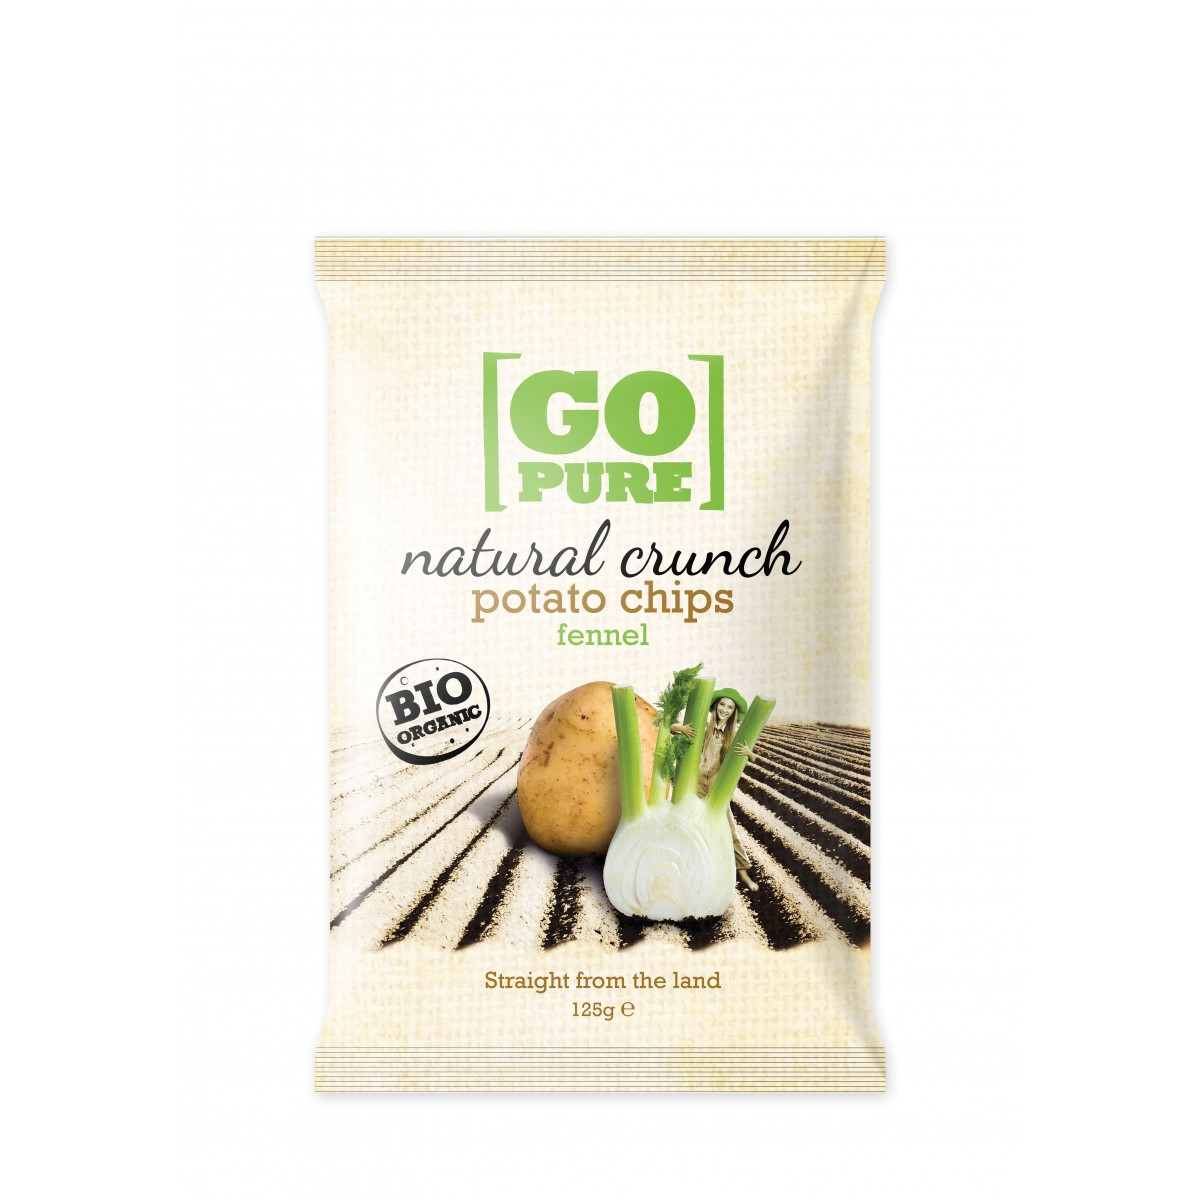 Natural Crunch Potato Chips Fennel